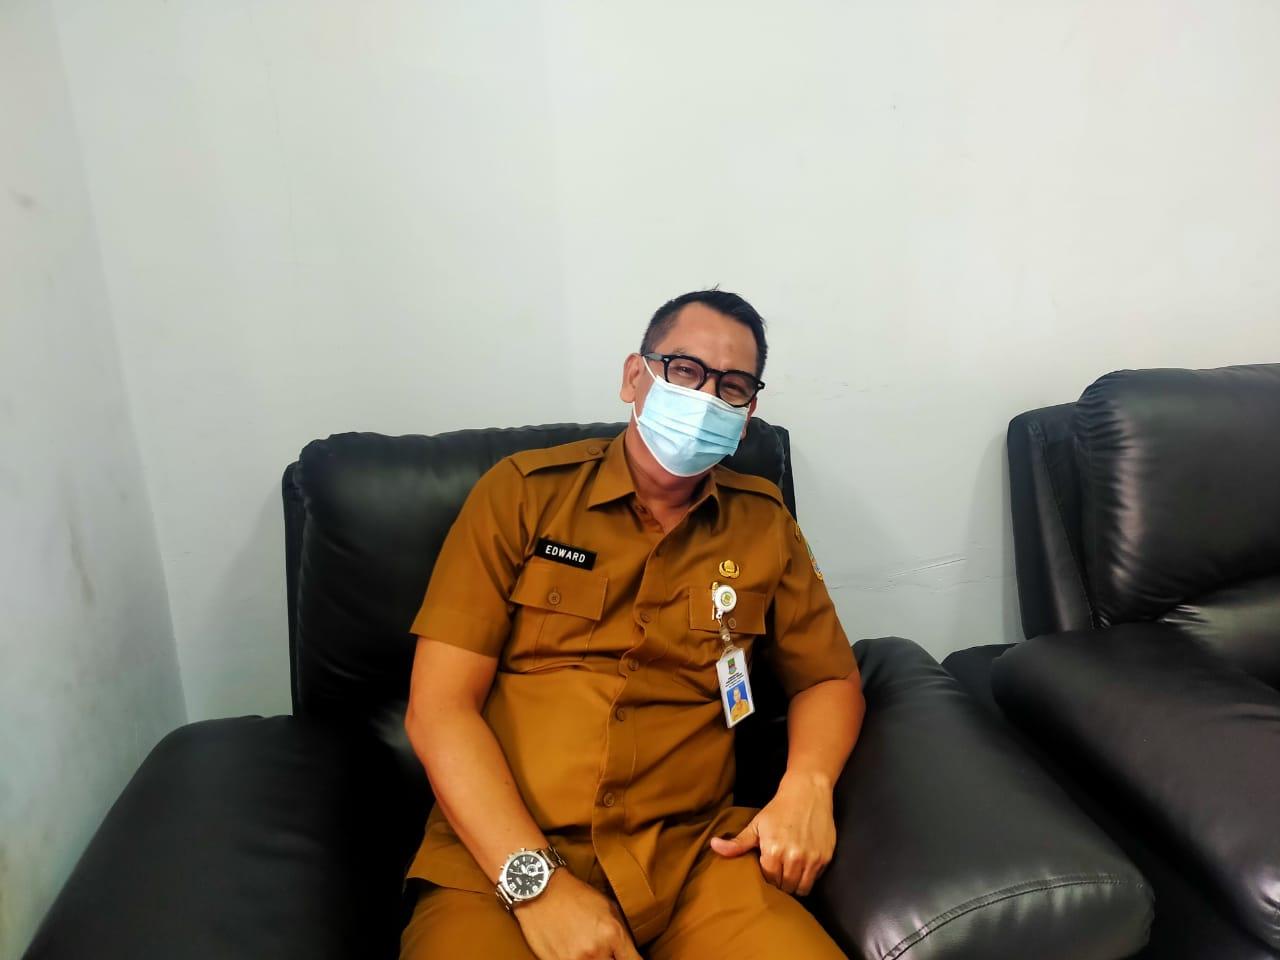 Sekretaris Badan Kepegawaian Pendidikan Pelatihan Daerah (BKPPD) Kabupaten Bekasi, Edward Sutarman. Foto: Riyan/Suara Bekasi Online